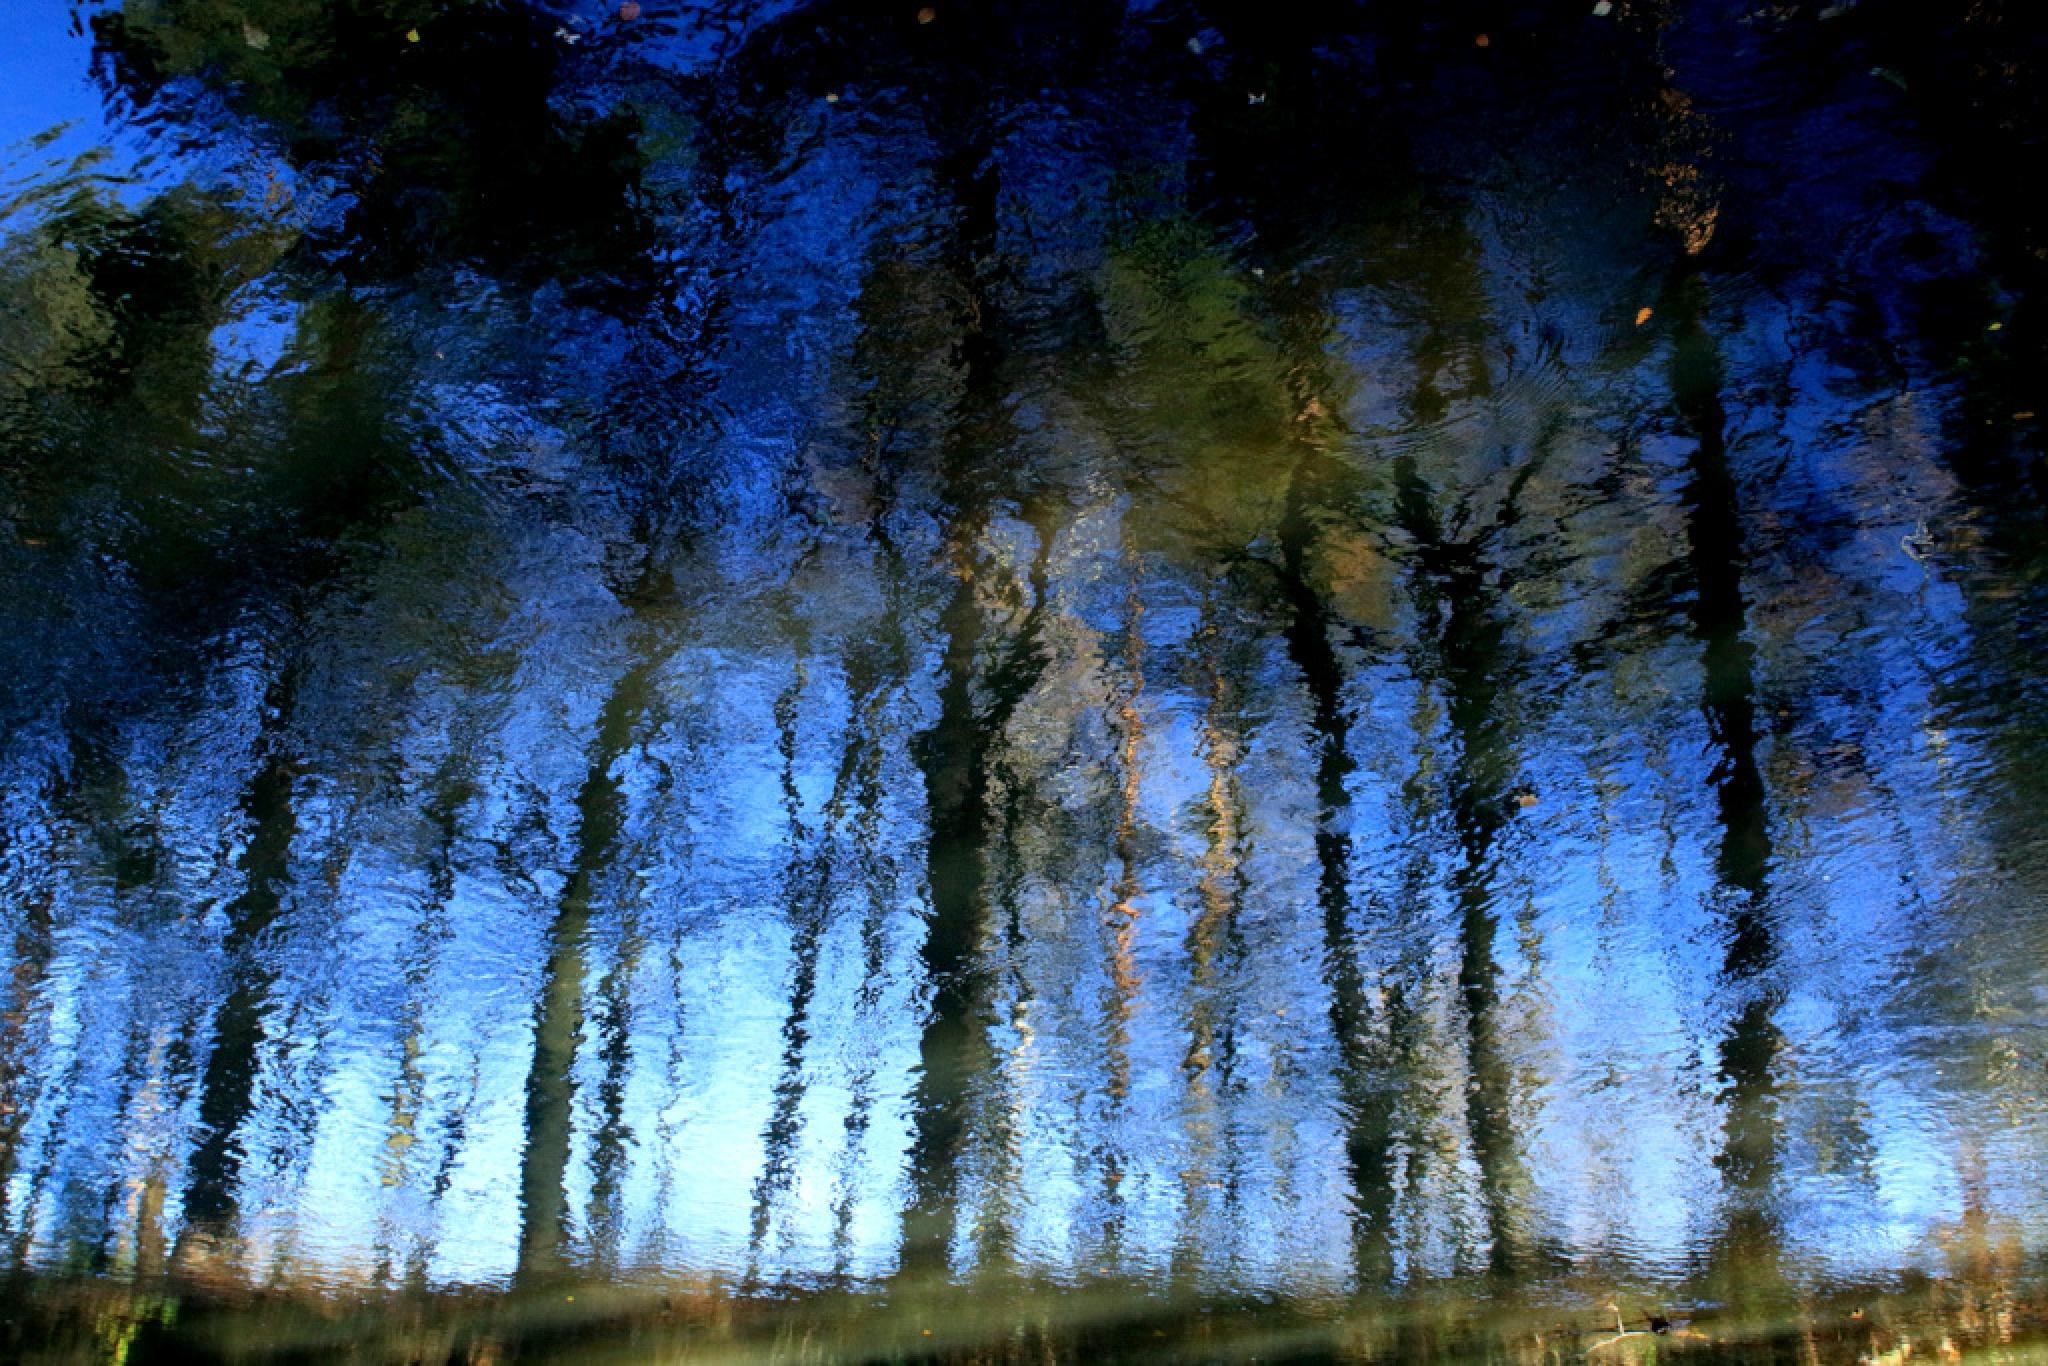 Forests of Goleniów by JAKOKTO PAUKAS